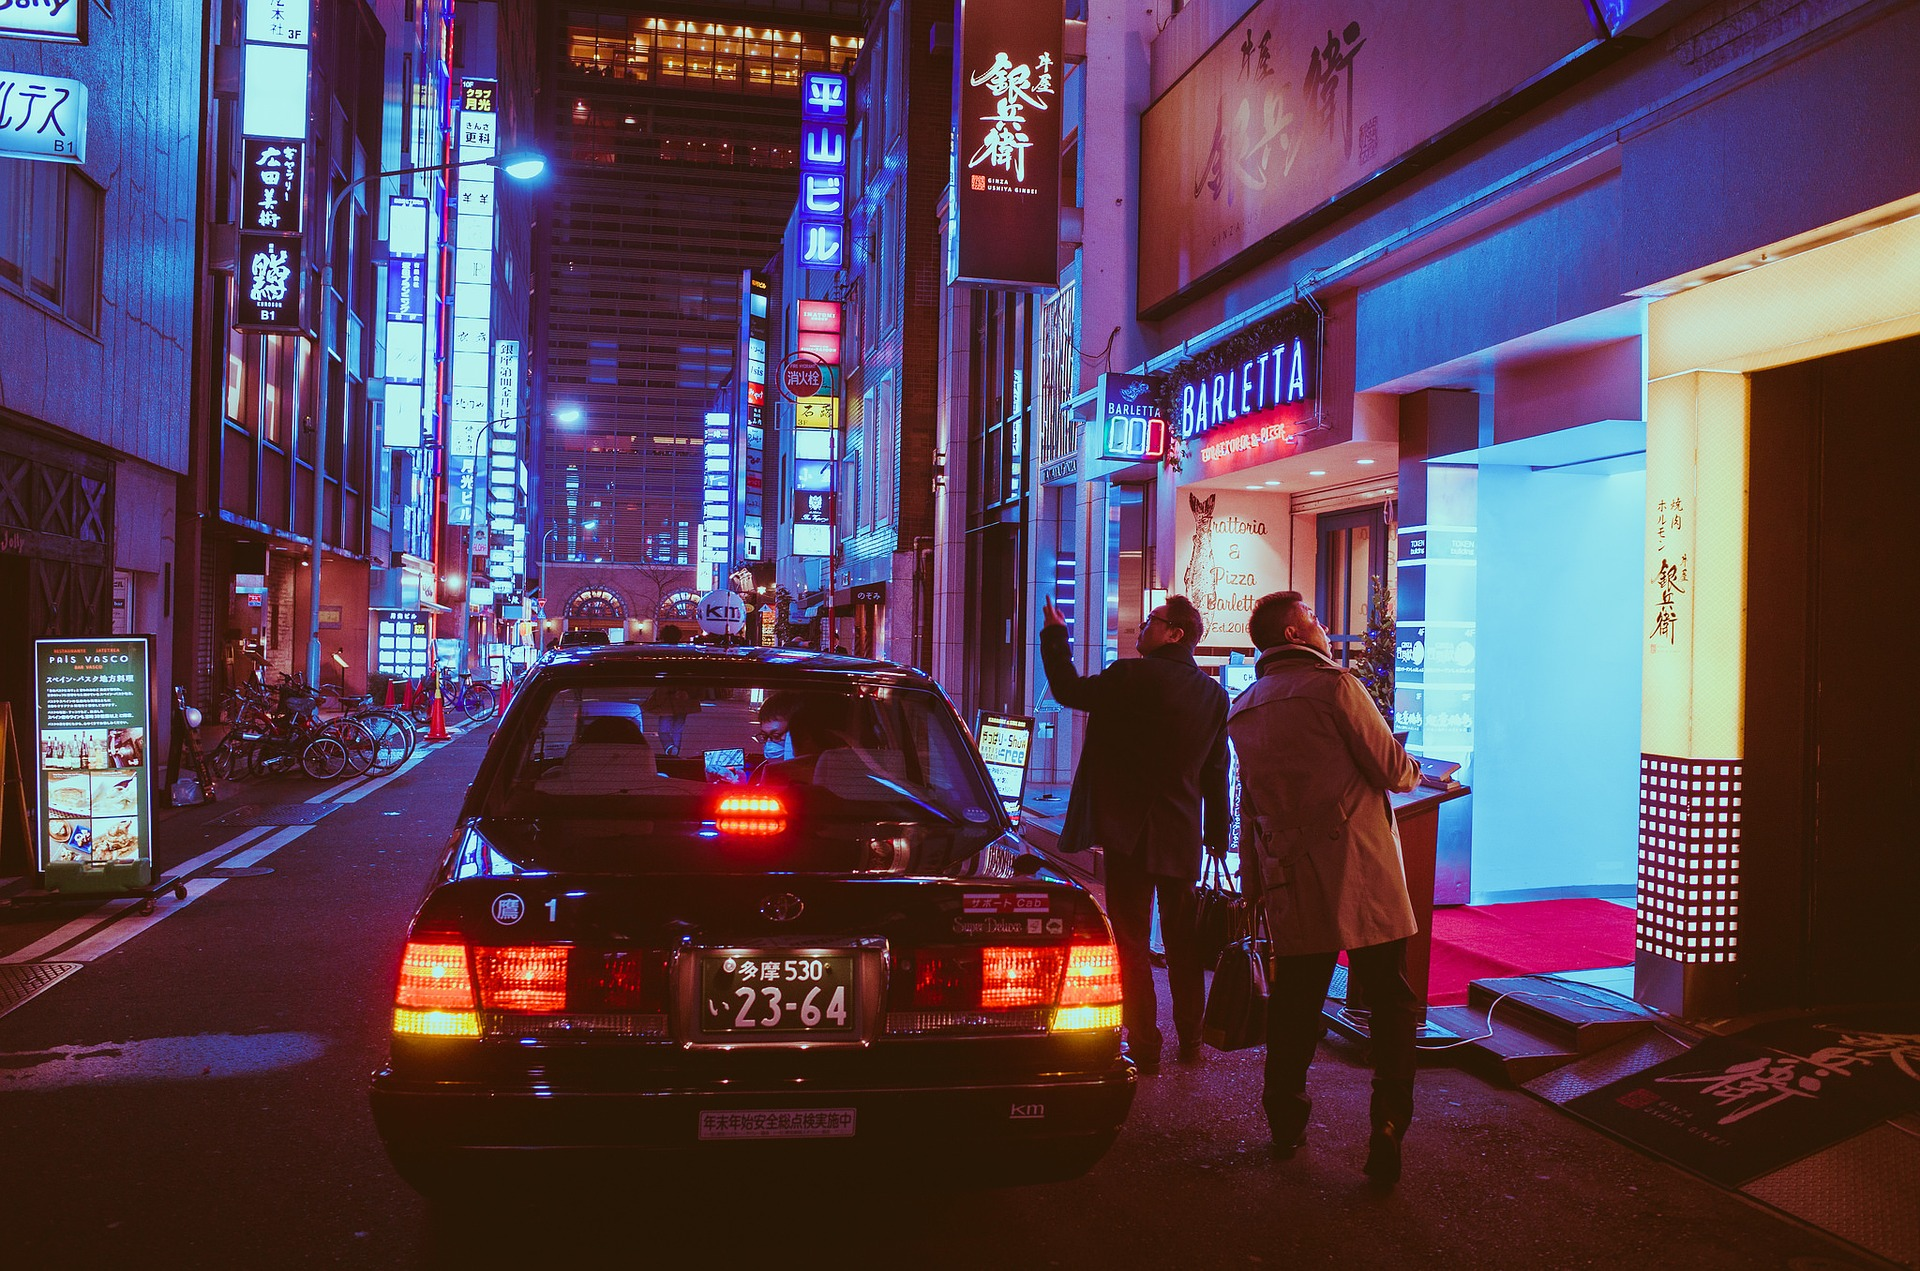 roaming around the street